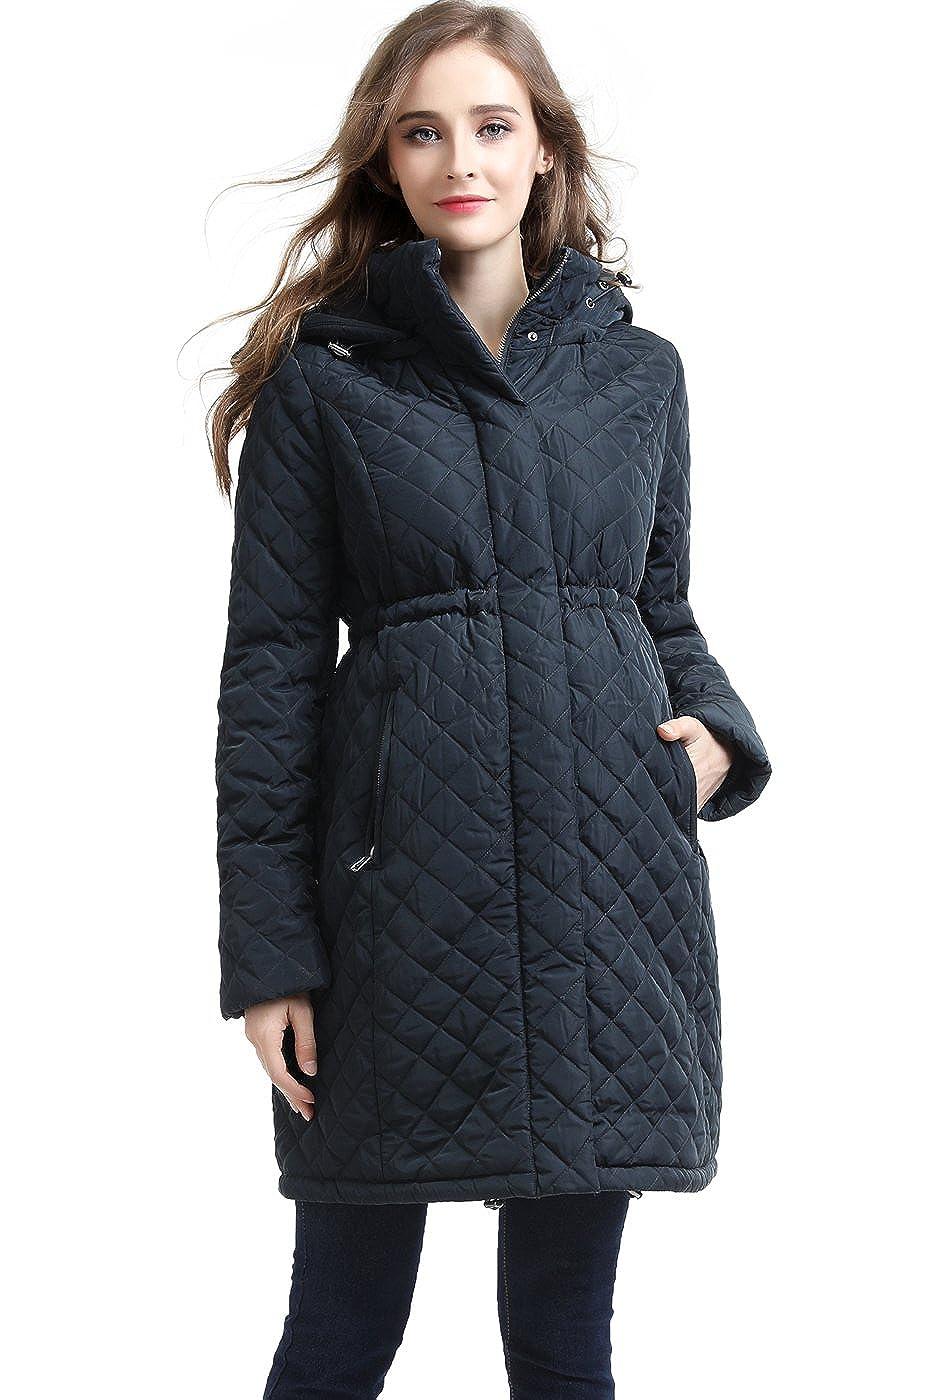 Momo Maternity Prue Quilted Parka Coat 924-150290-STG-L